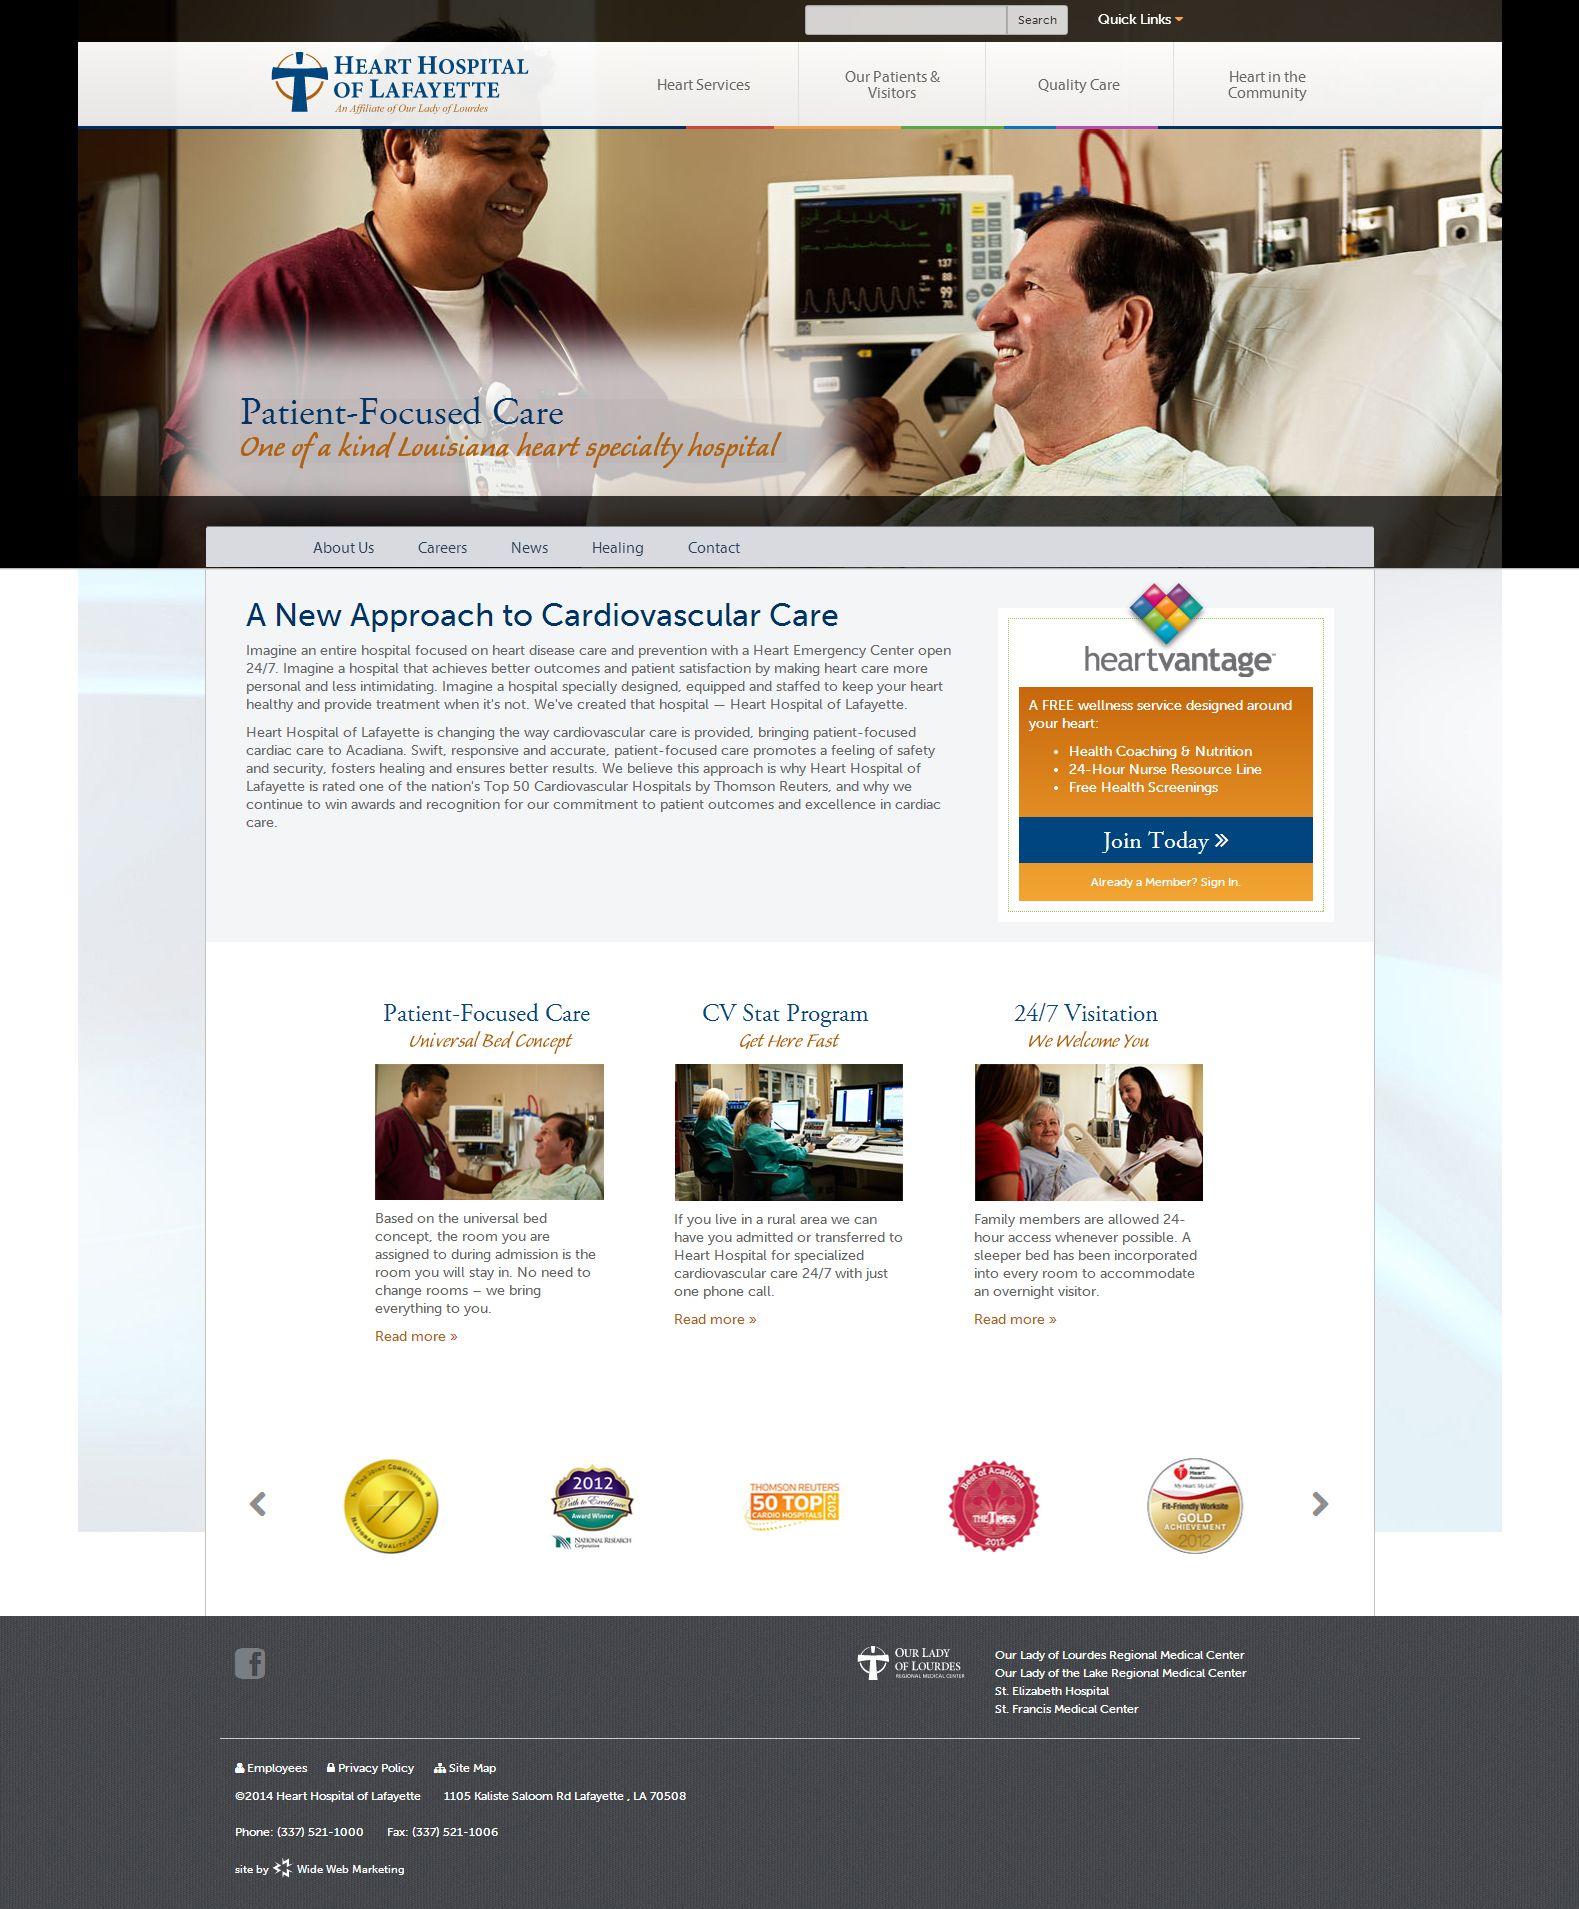 Website Design And Development For Heart Hospital Of Lafayette Http Www Hearthospitaloflafayette Com Heart Hospital Hospital Web Marketing